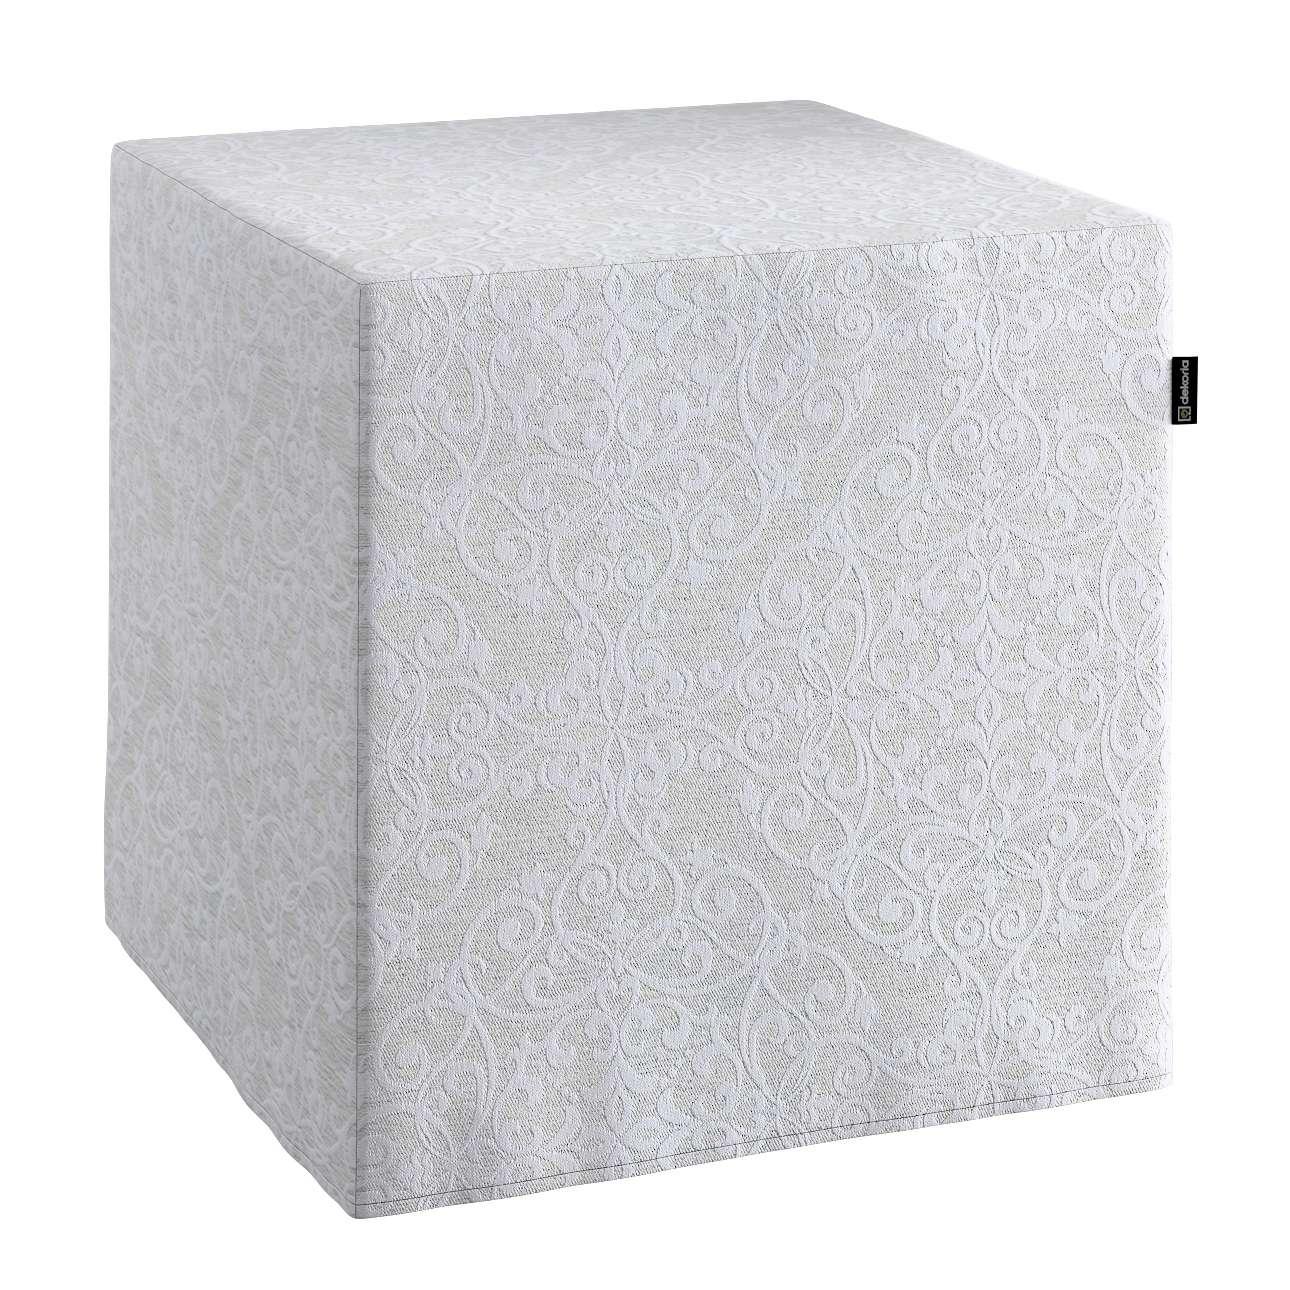 Sedák Cube - kostka pevná 40x40x40 v kolekci Venice, látka: 140-49